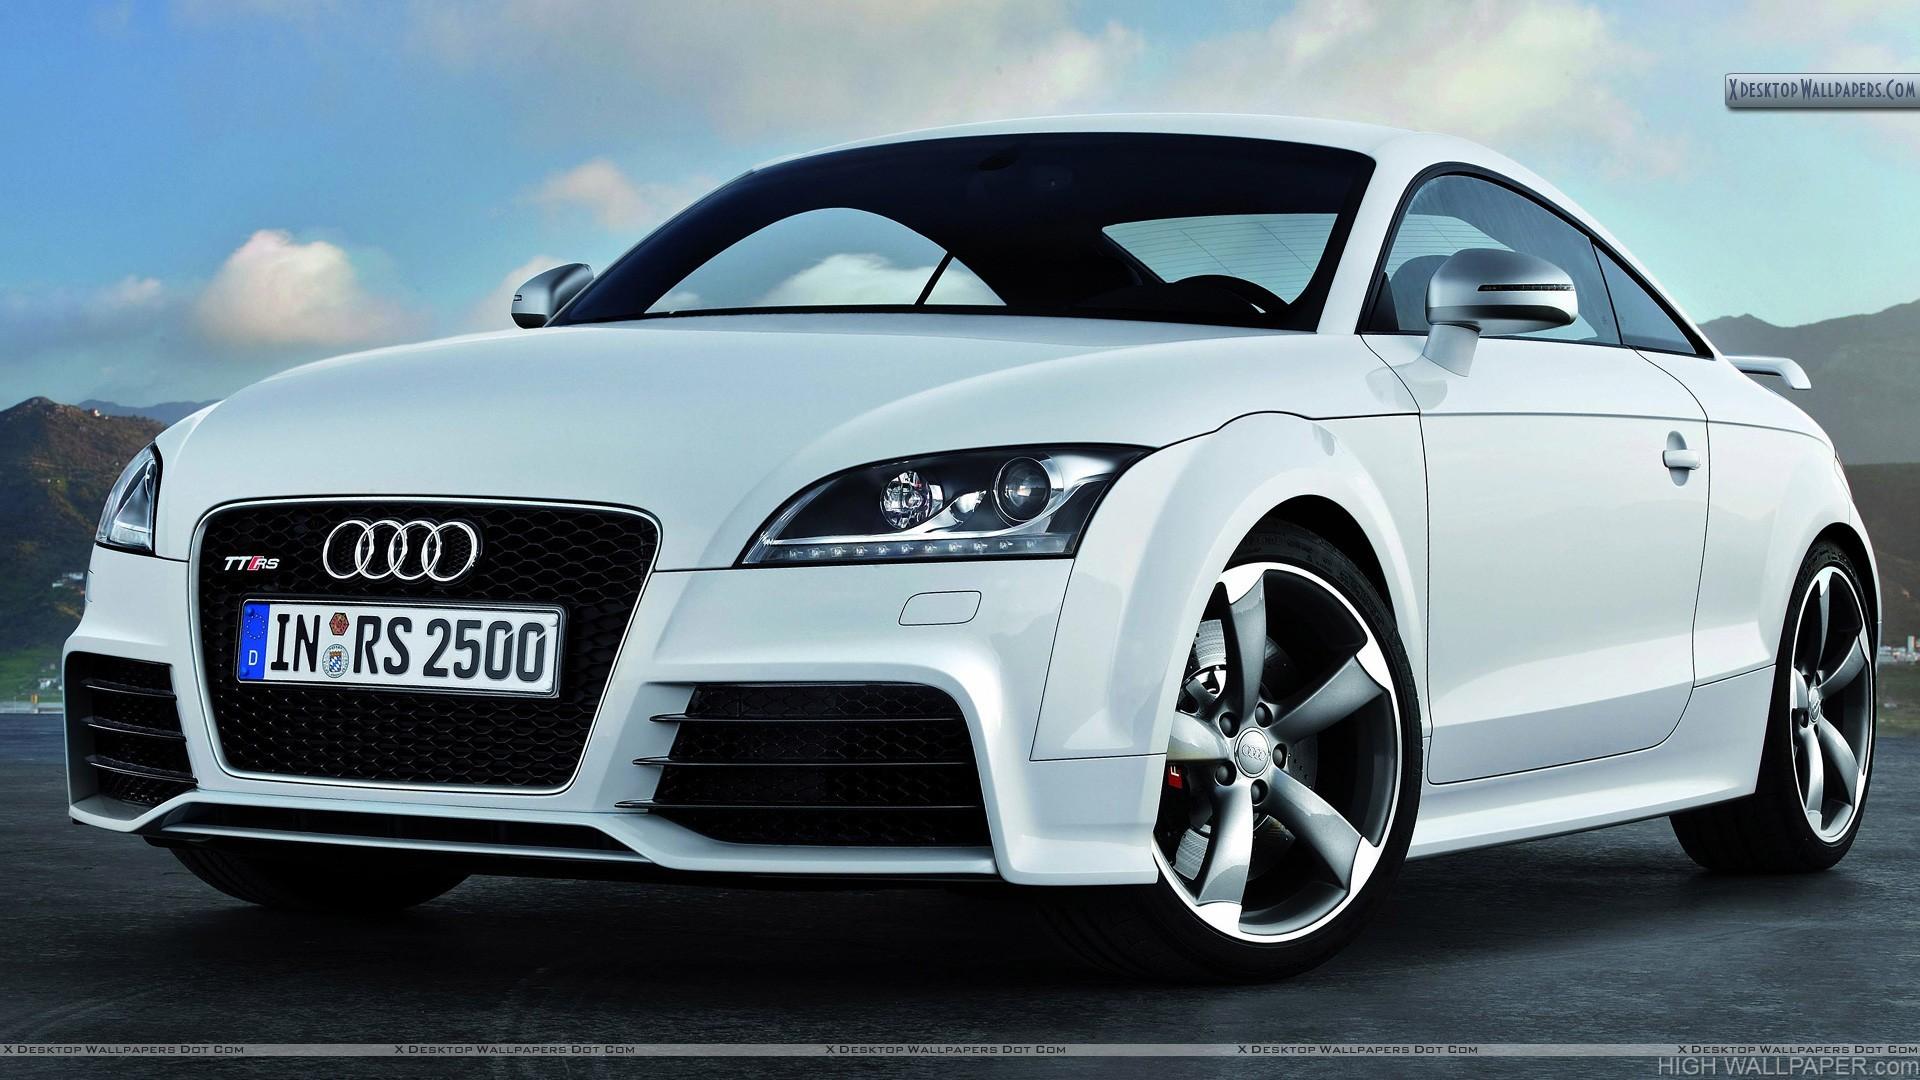 Audi TT RS White Color Front Pose